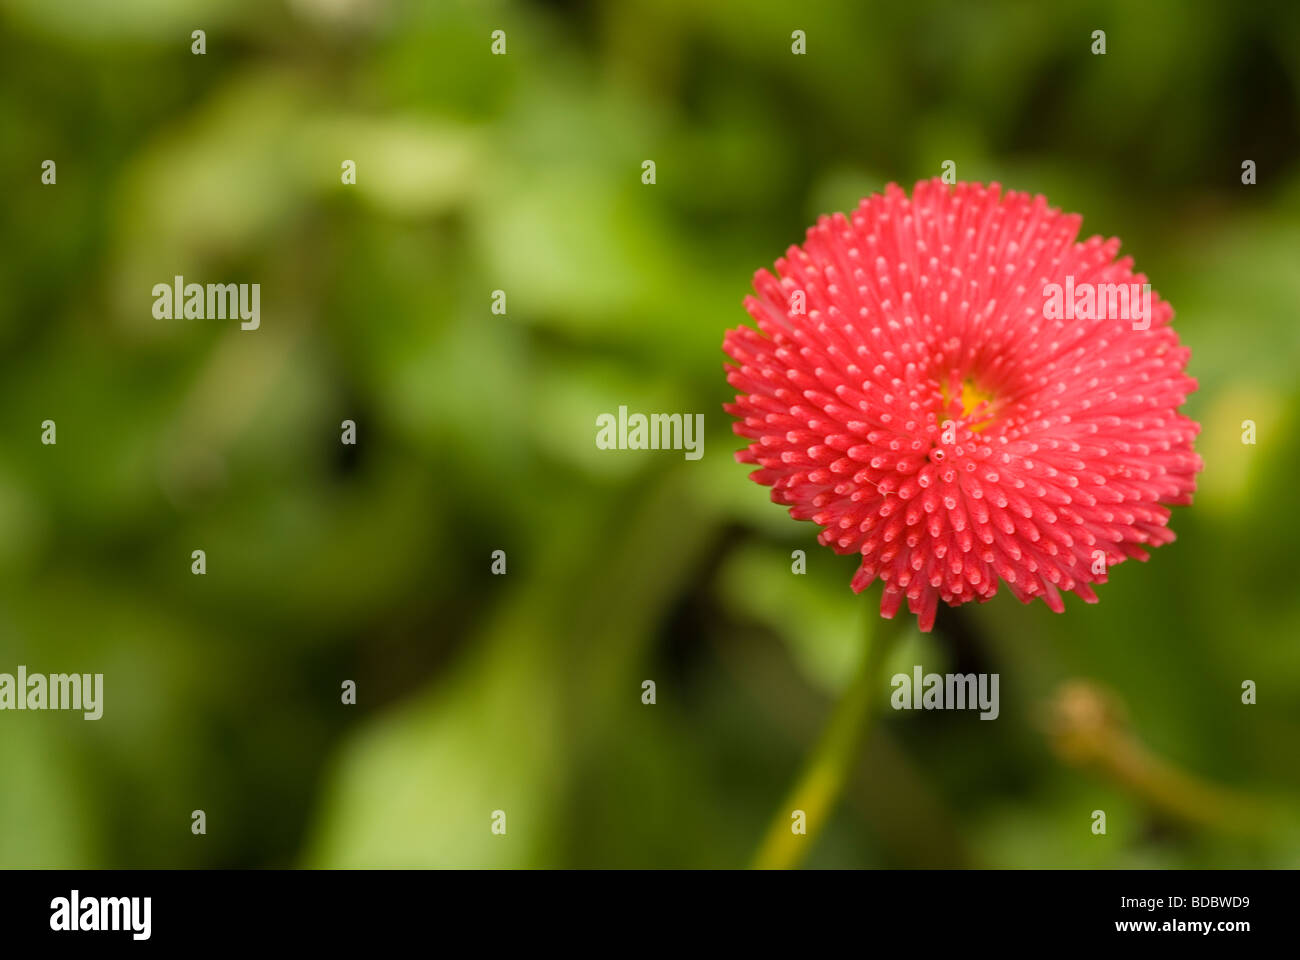 Bellis perennis, Asteraceae - Stock Image